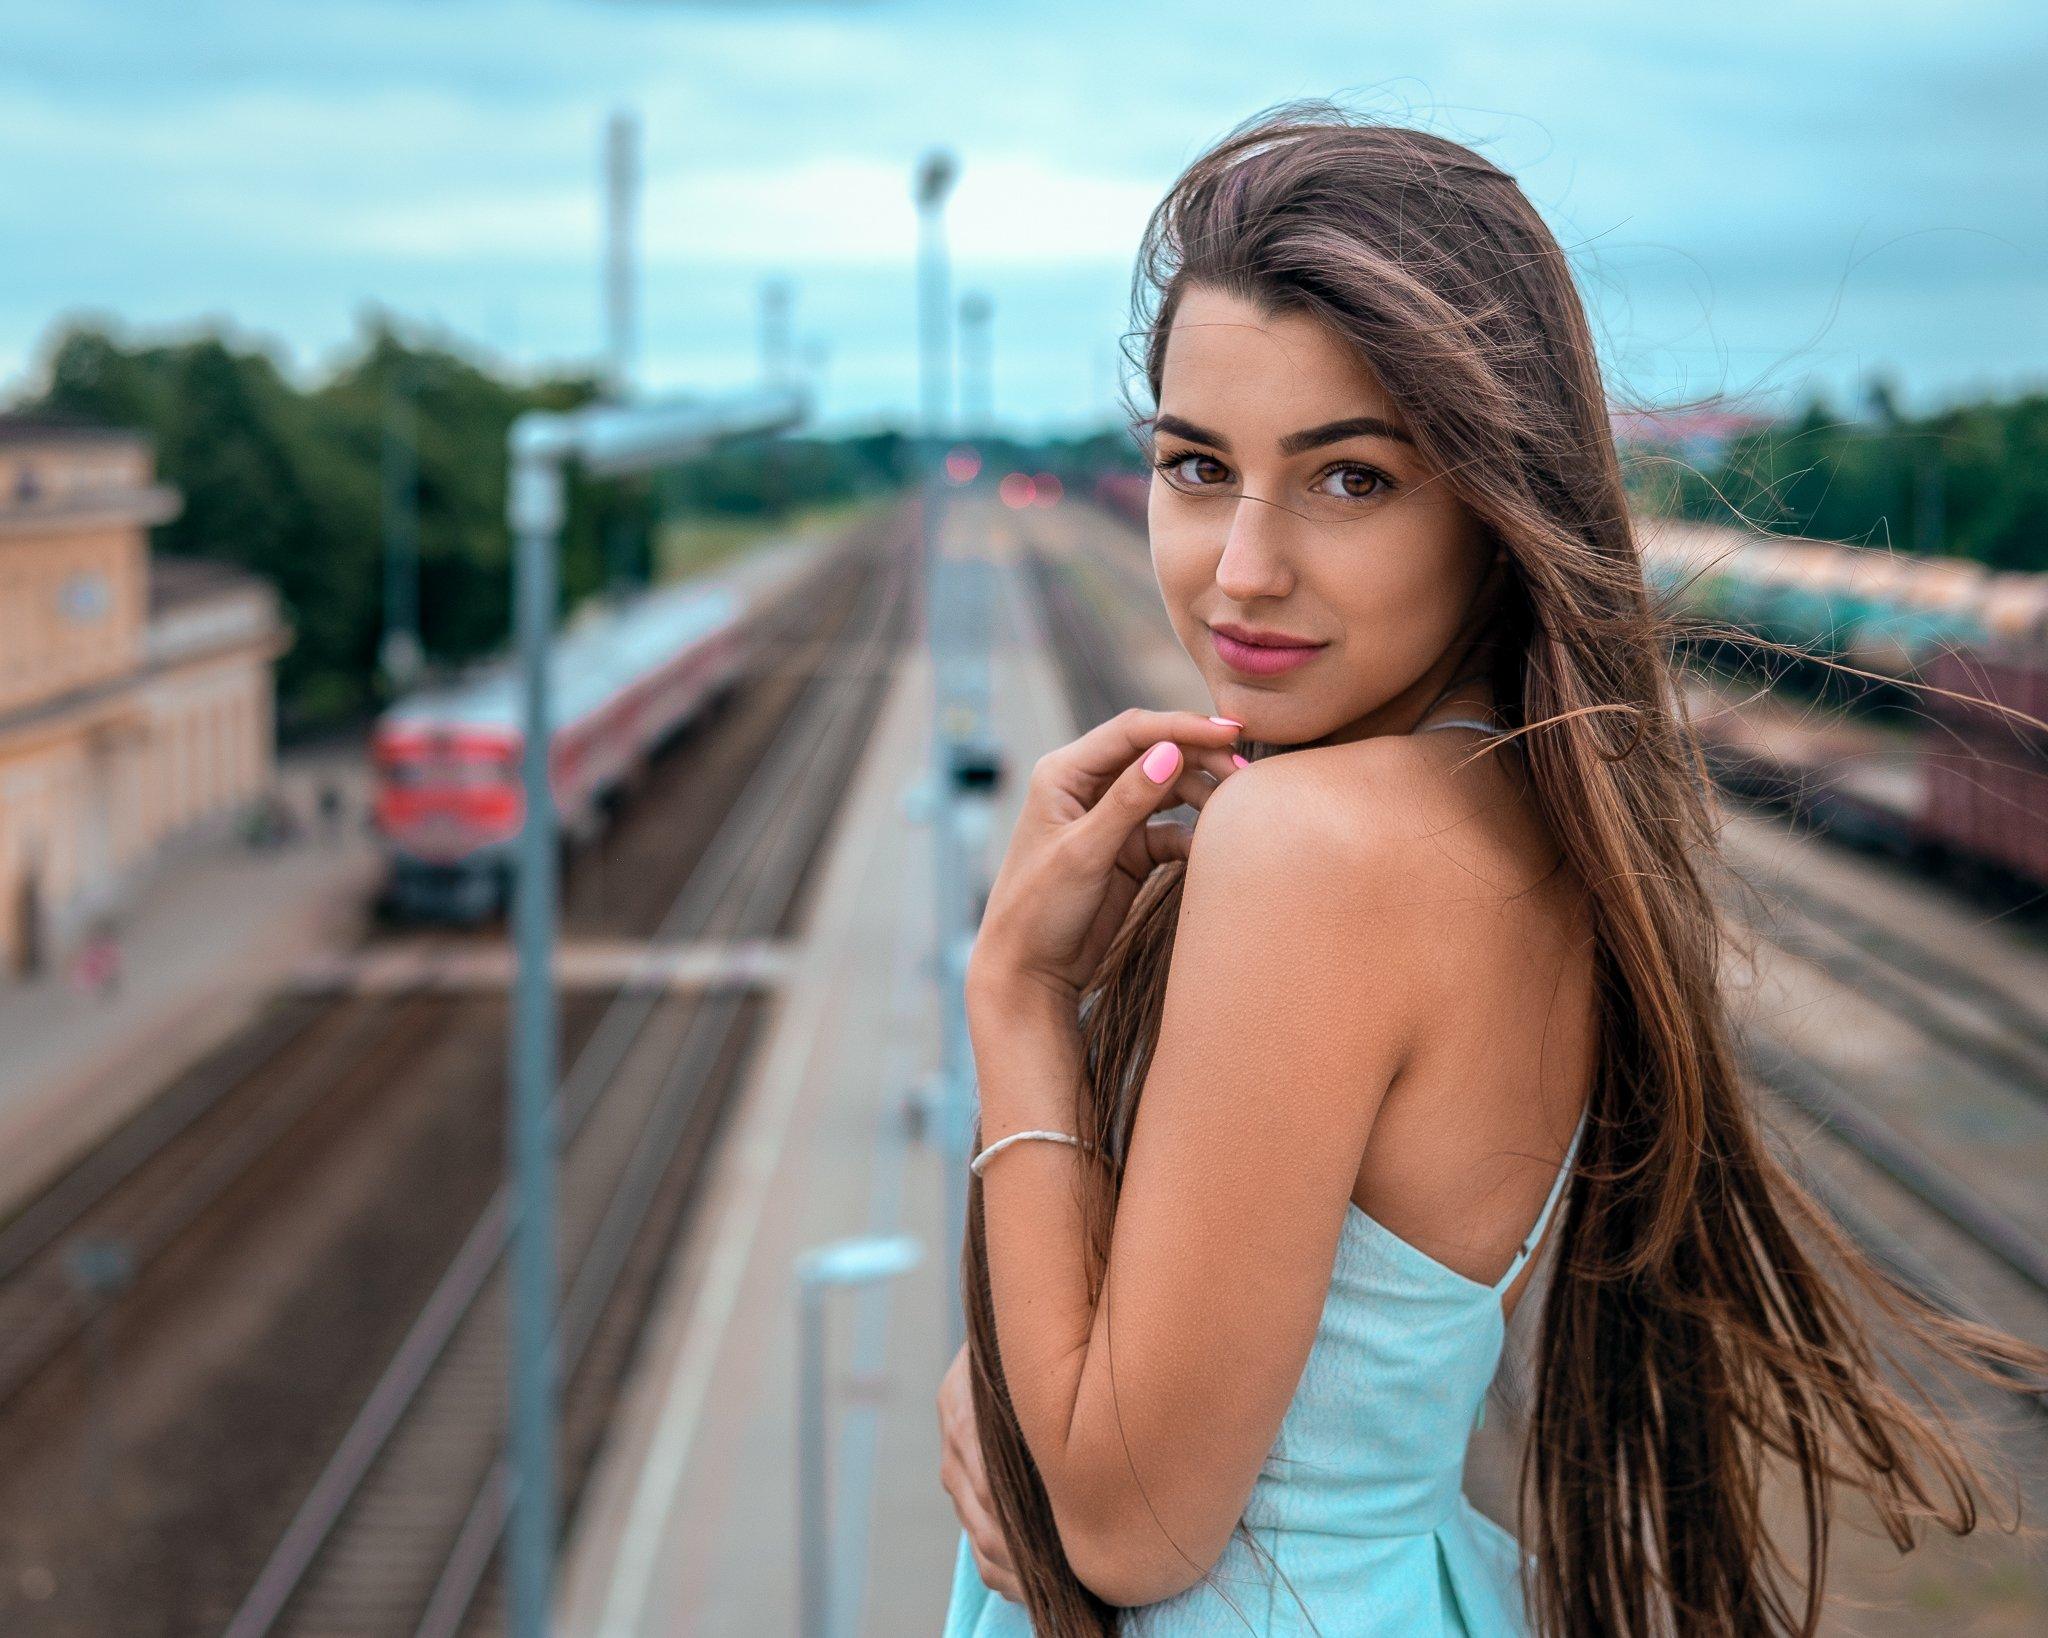 girl, summer, beautiful, portrait, train, station, hair, female, Saulius Ke